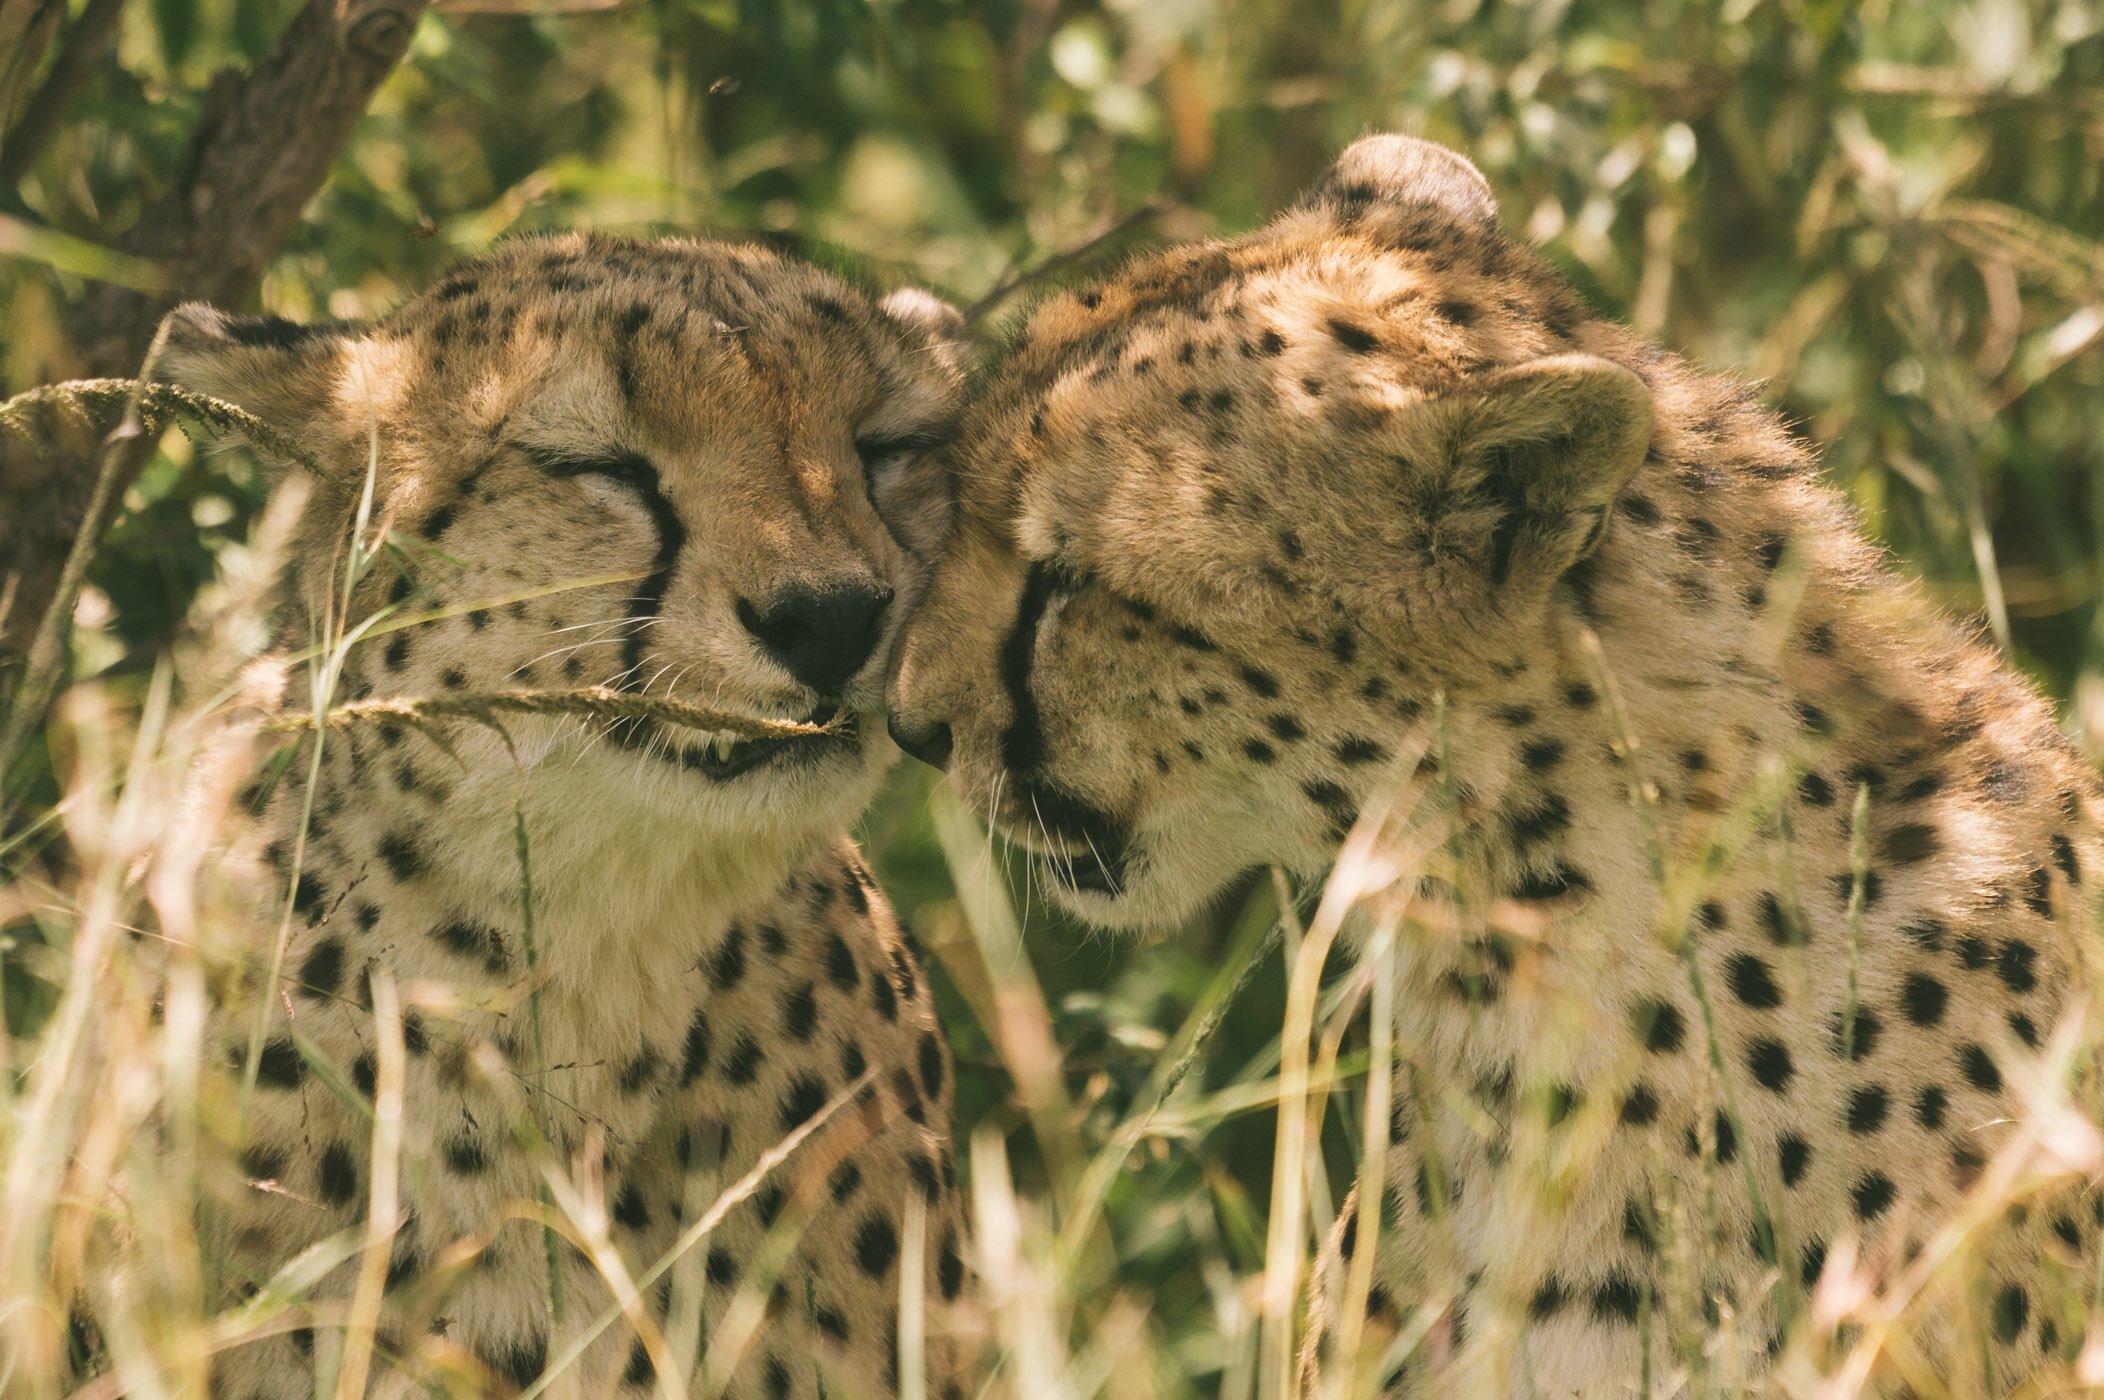 Cheetah Brothers in the Maasai Mara in Kenya